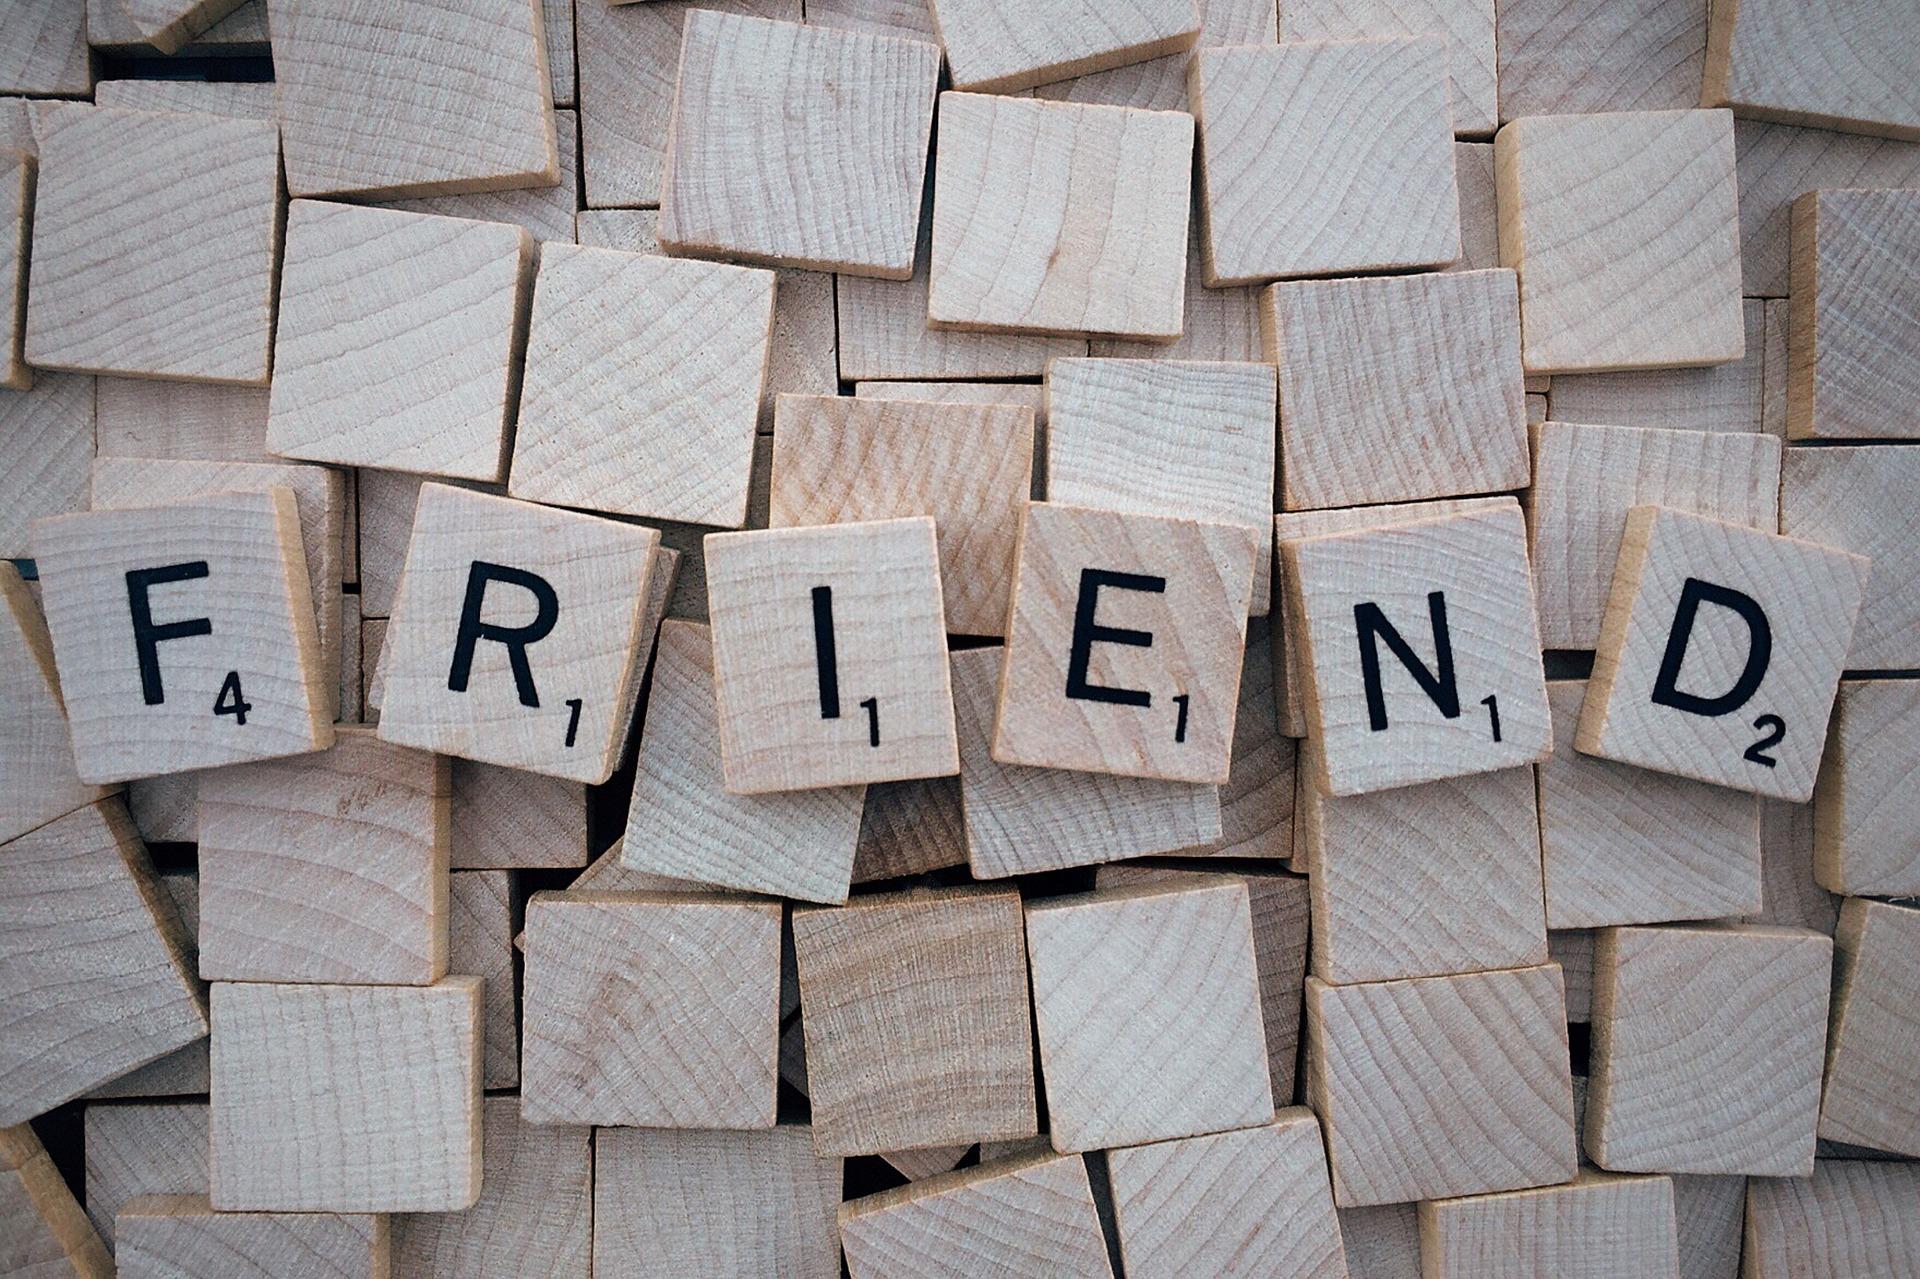 friend-1820040_1920.jpg